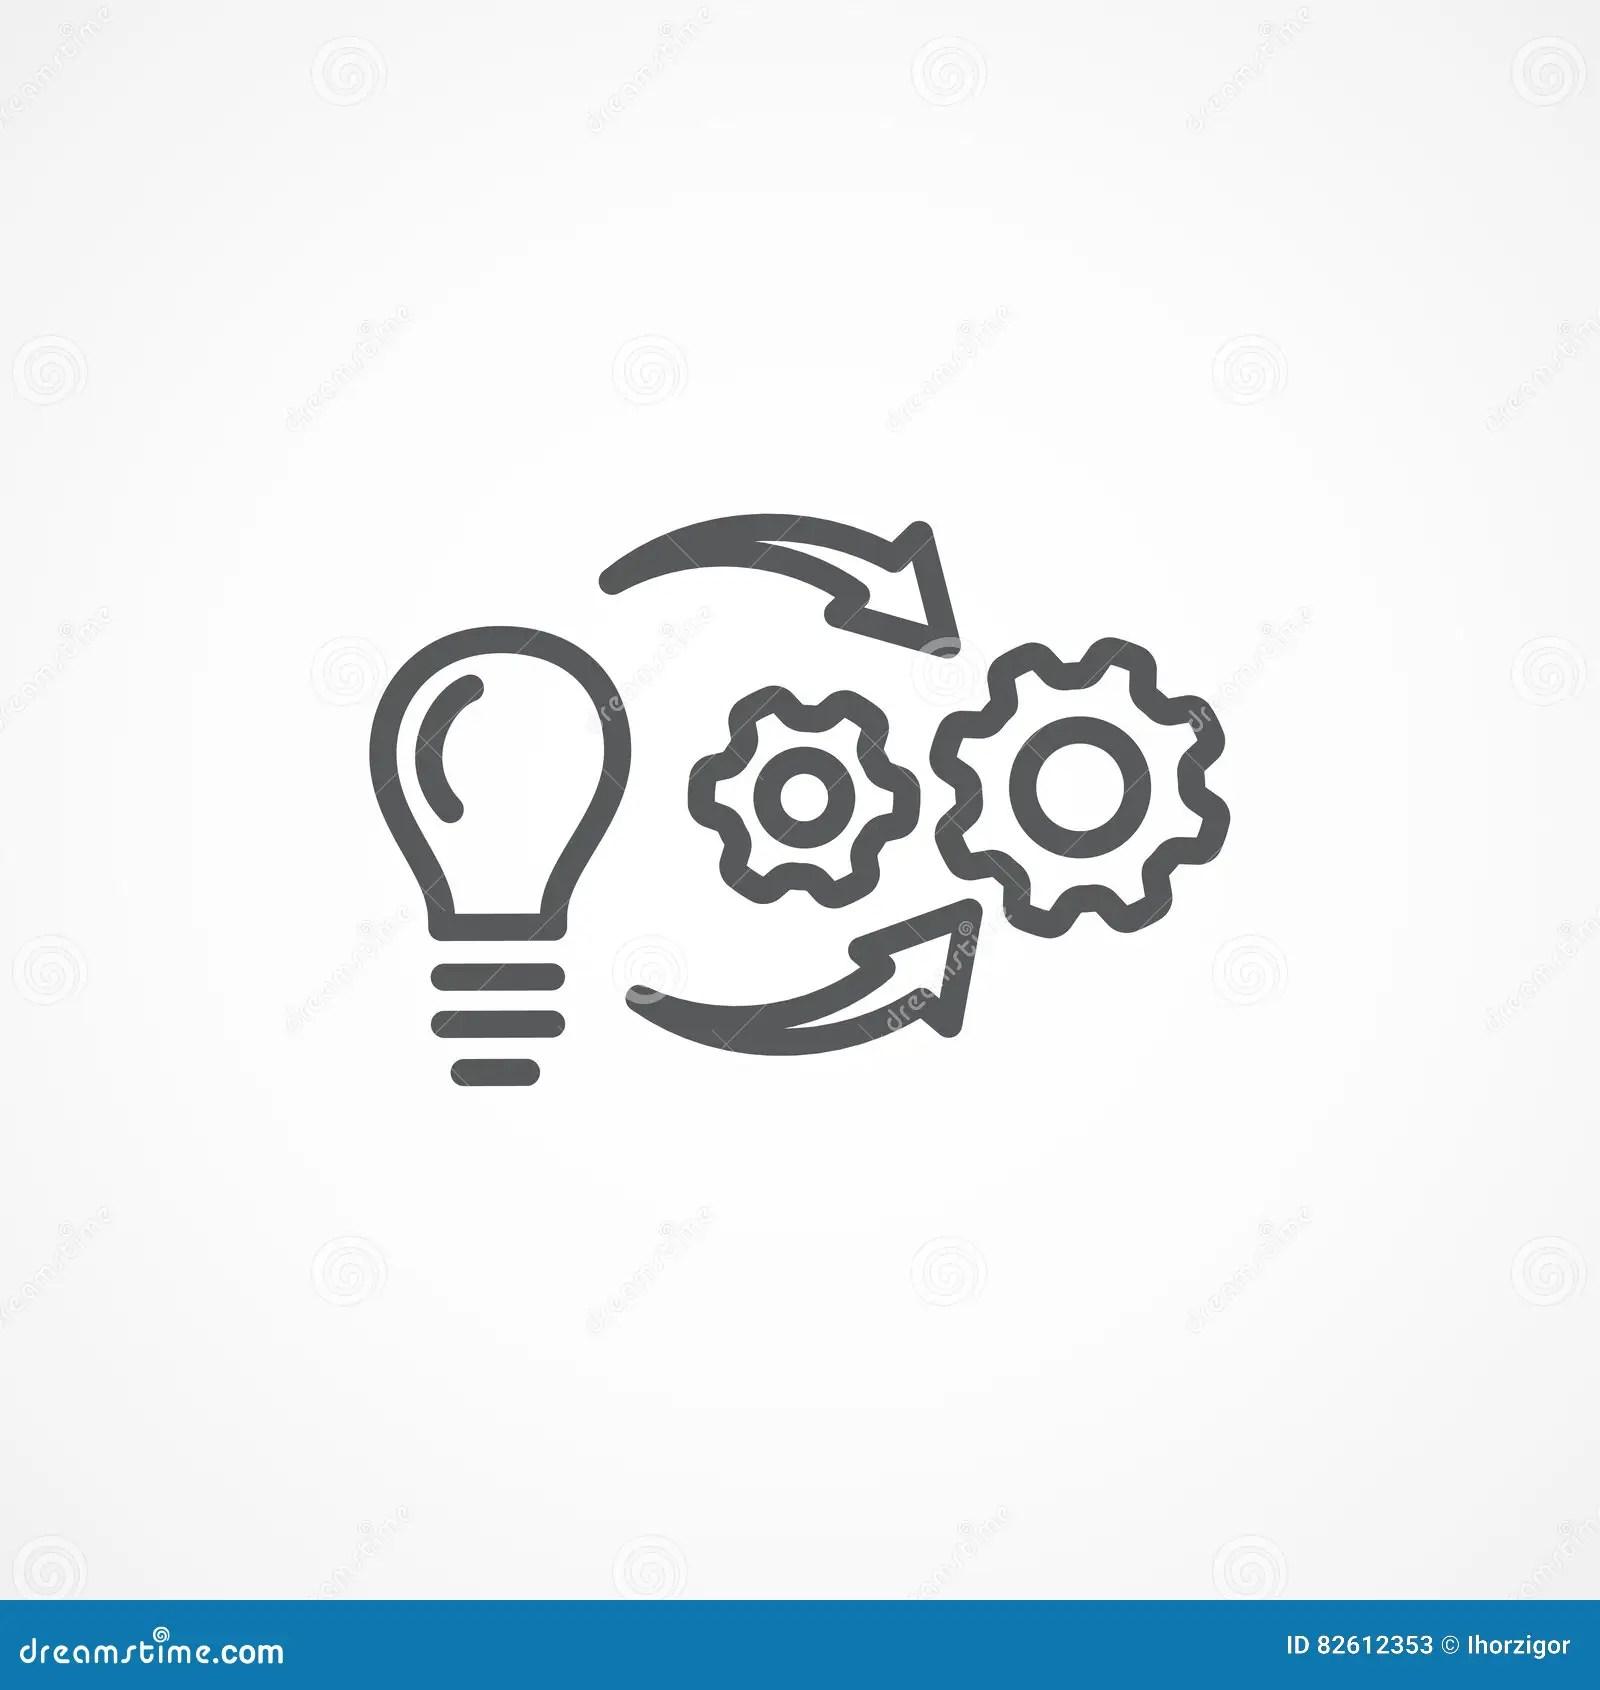 Programmer, Mechanical Engineer Cartoon Vector